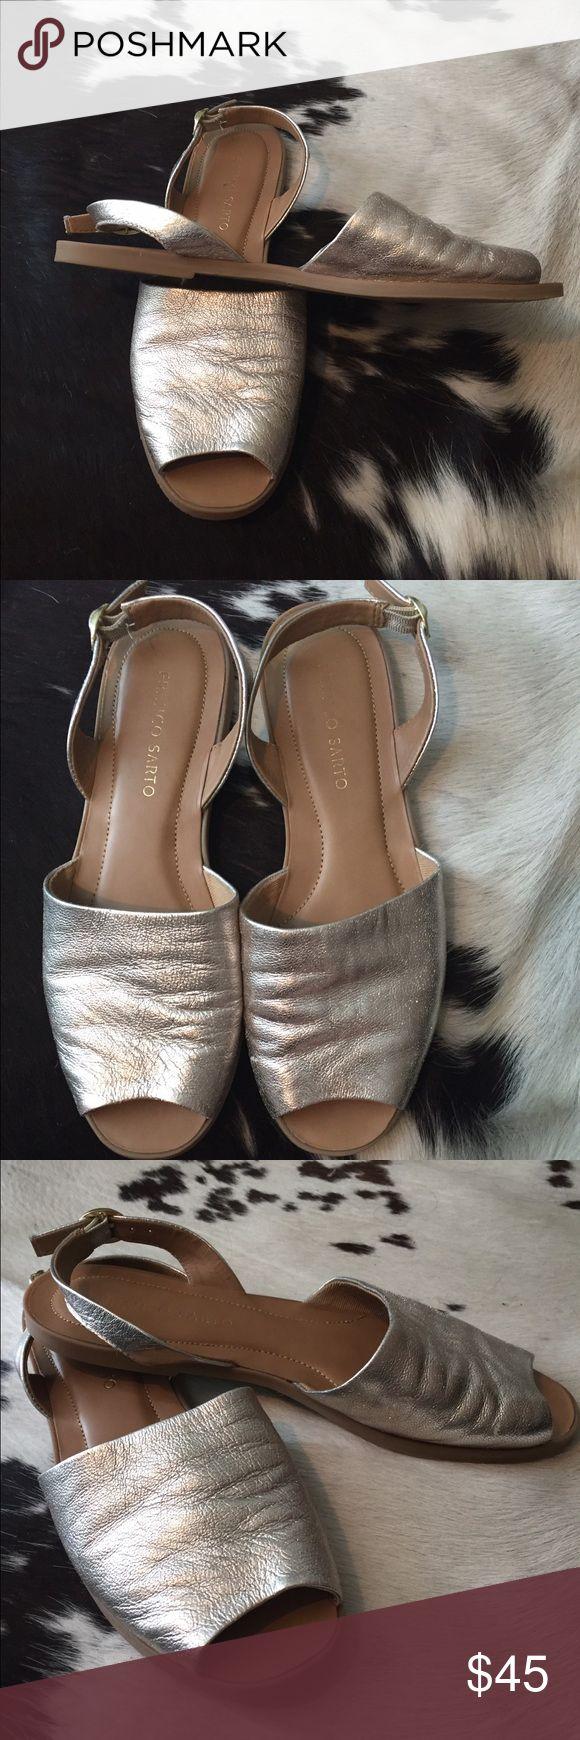 Franco Sarto sandals Gently worn Franco Sarto silver soft leather sandals. Franco Sarto Shoes Sandals